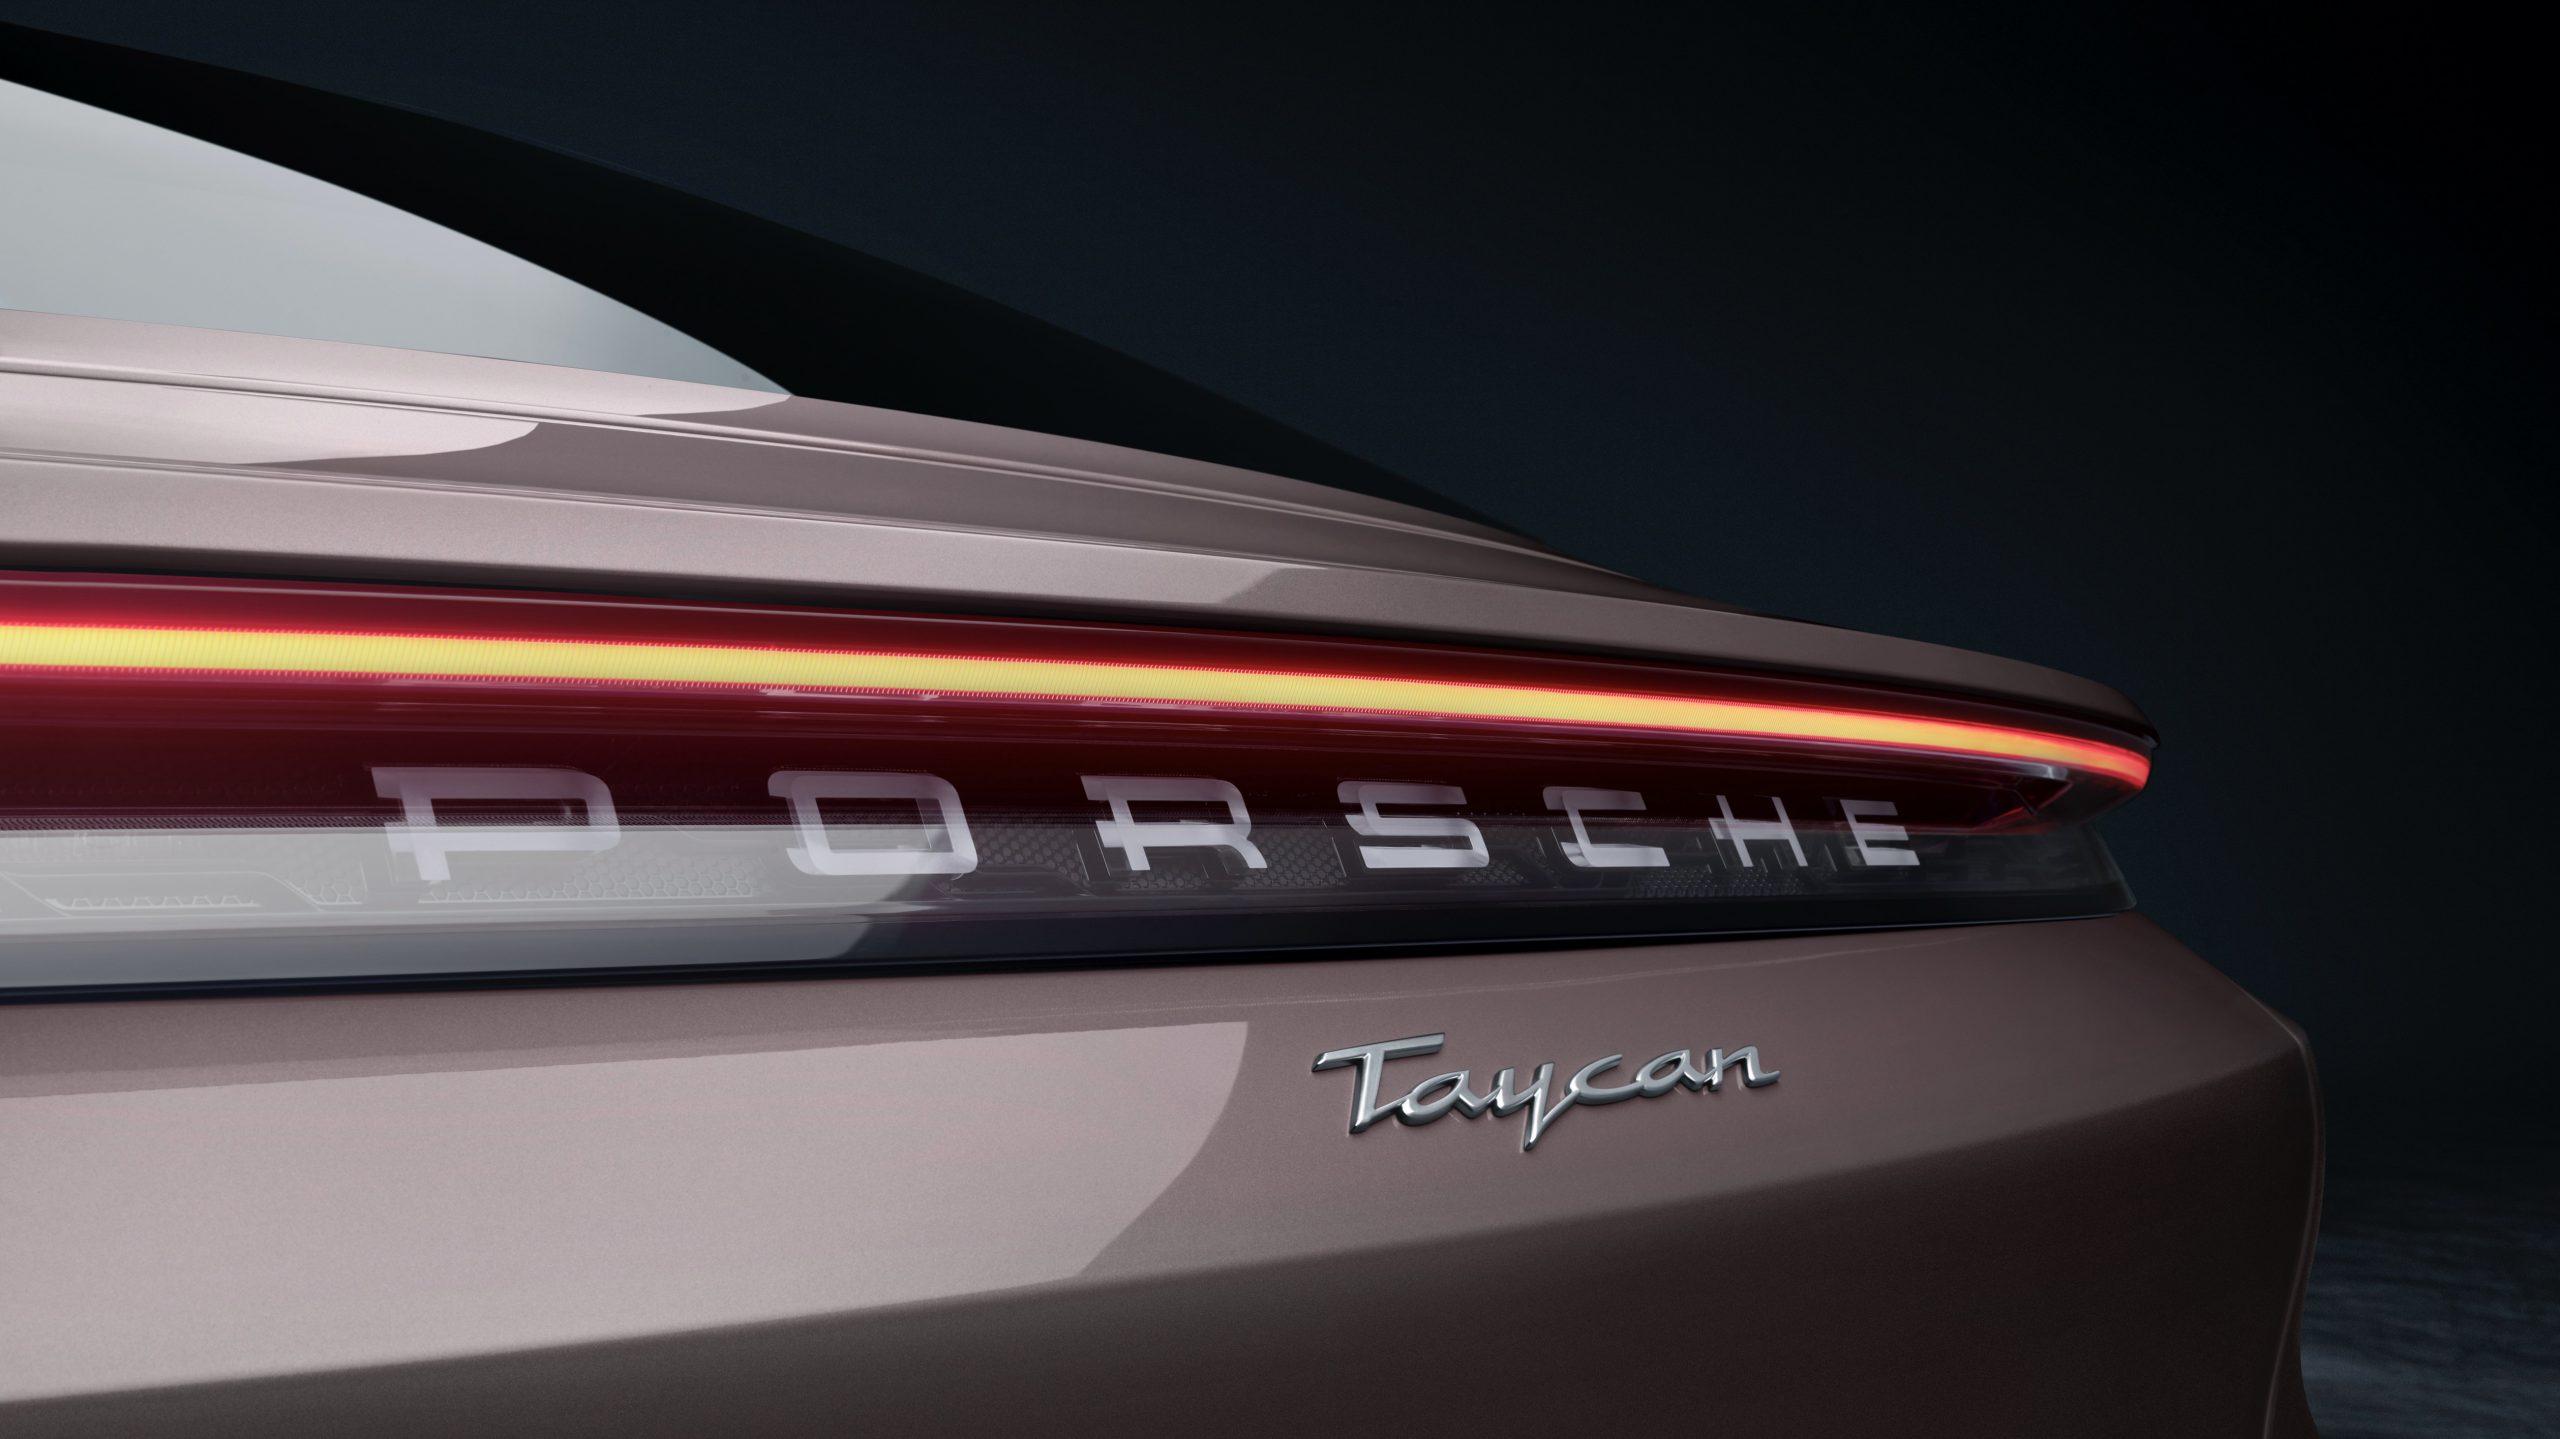 Porsche amplía su gama Taycan con un cuarto modelo de 408 caballos